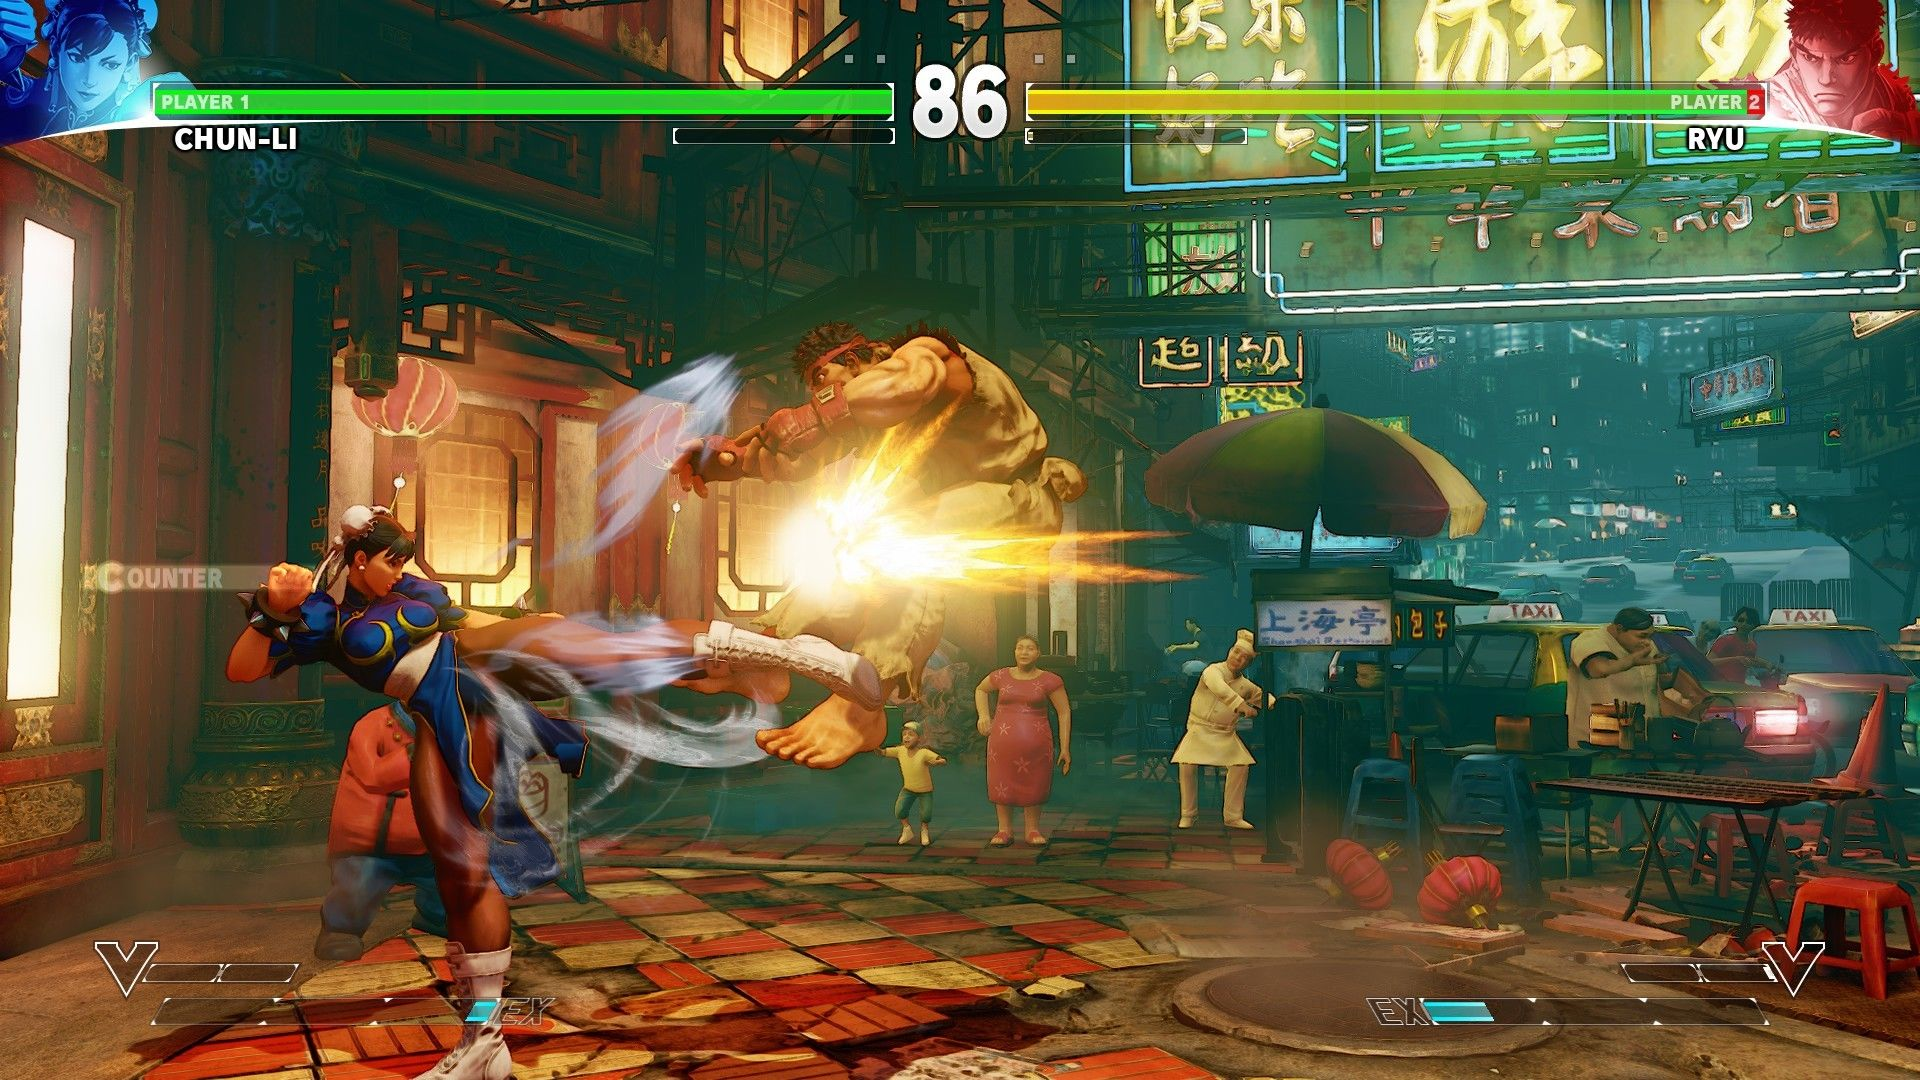 Tekken 3 (pc game)